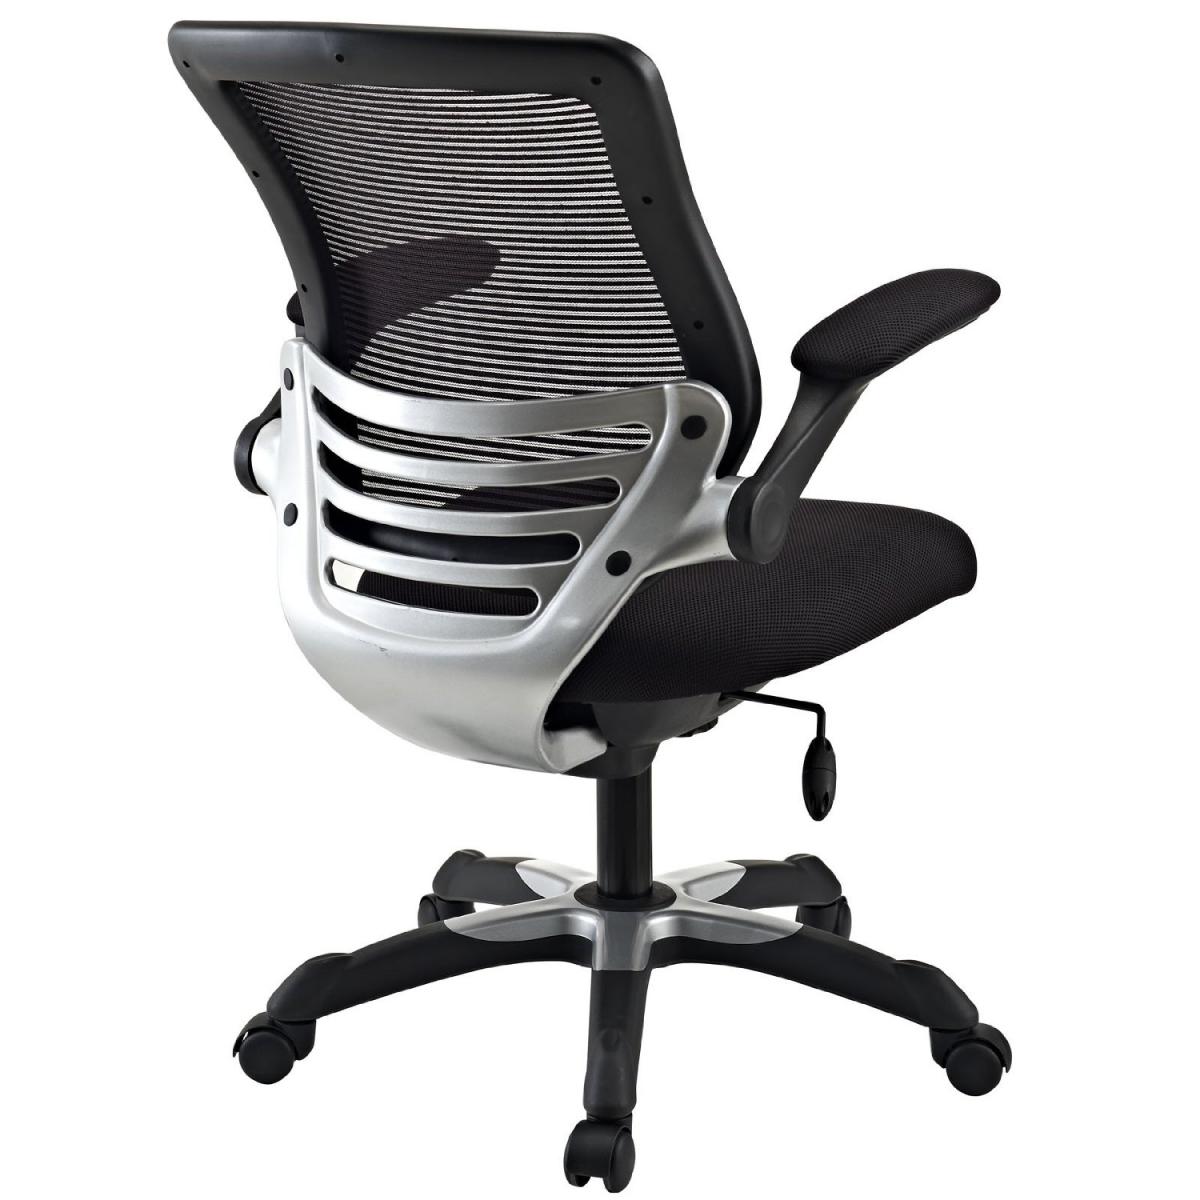 100 herman miller chair alternative 43 best good goods imag